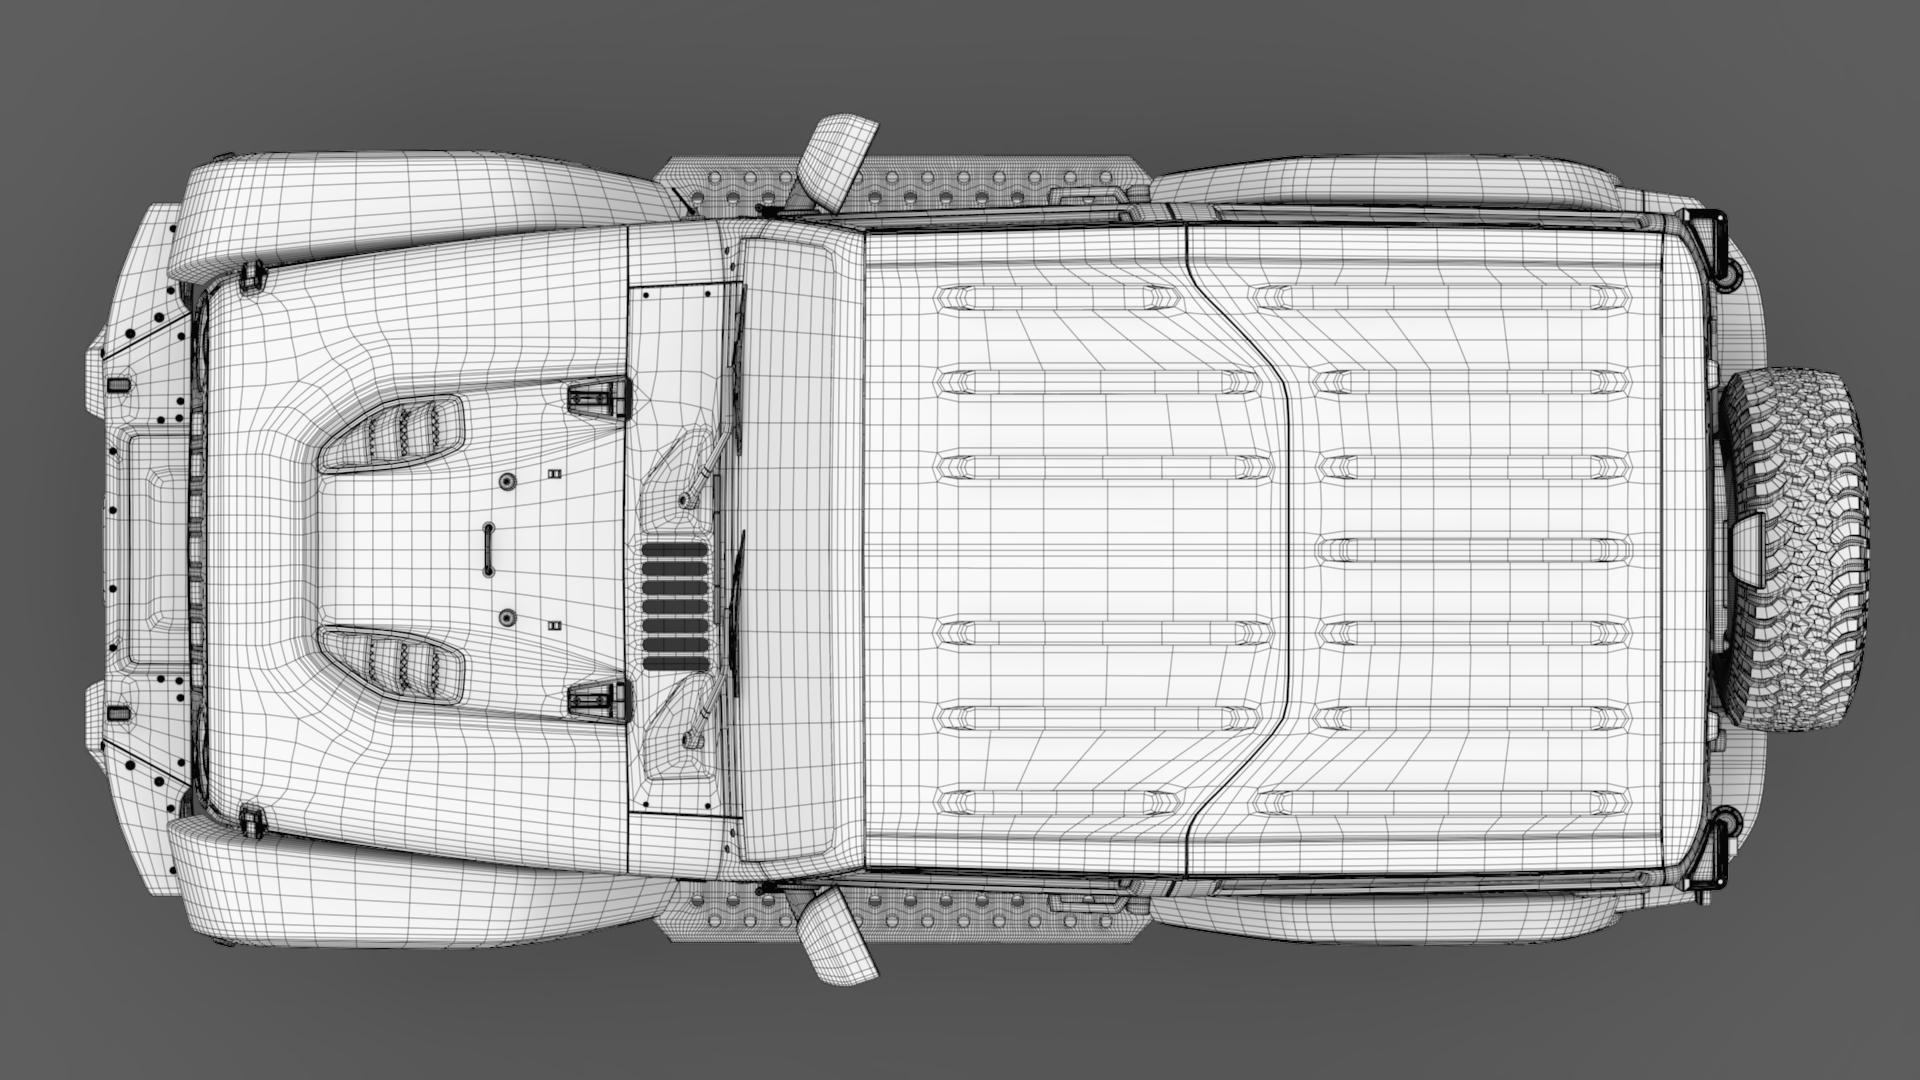 jeep wrangler rubicon recon jk 2017 3d model max fbx lwo ma mb hrc xsi obj 276956